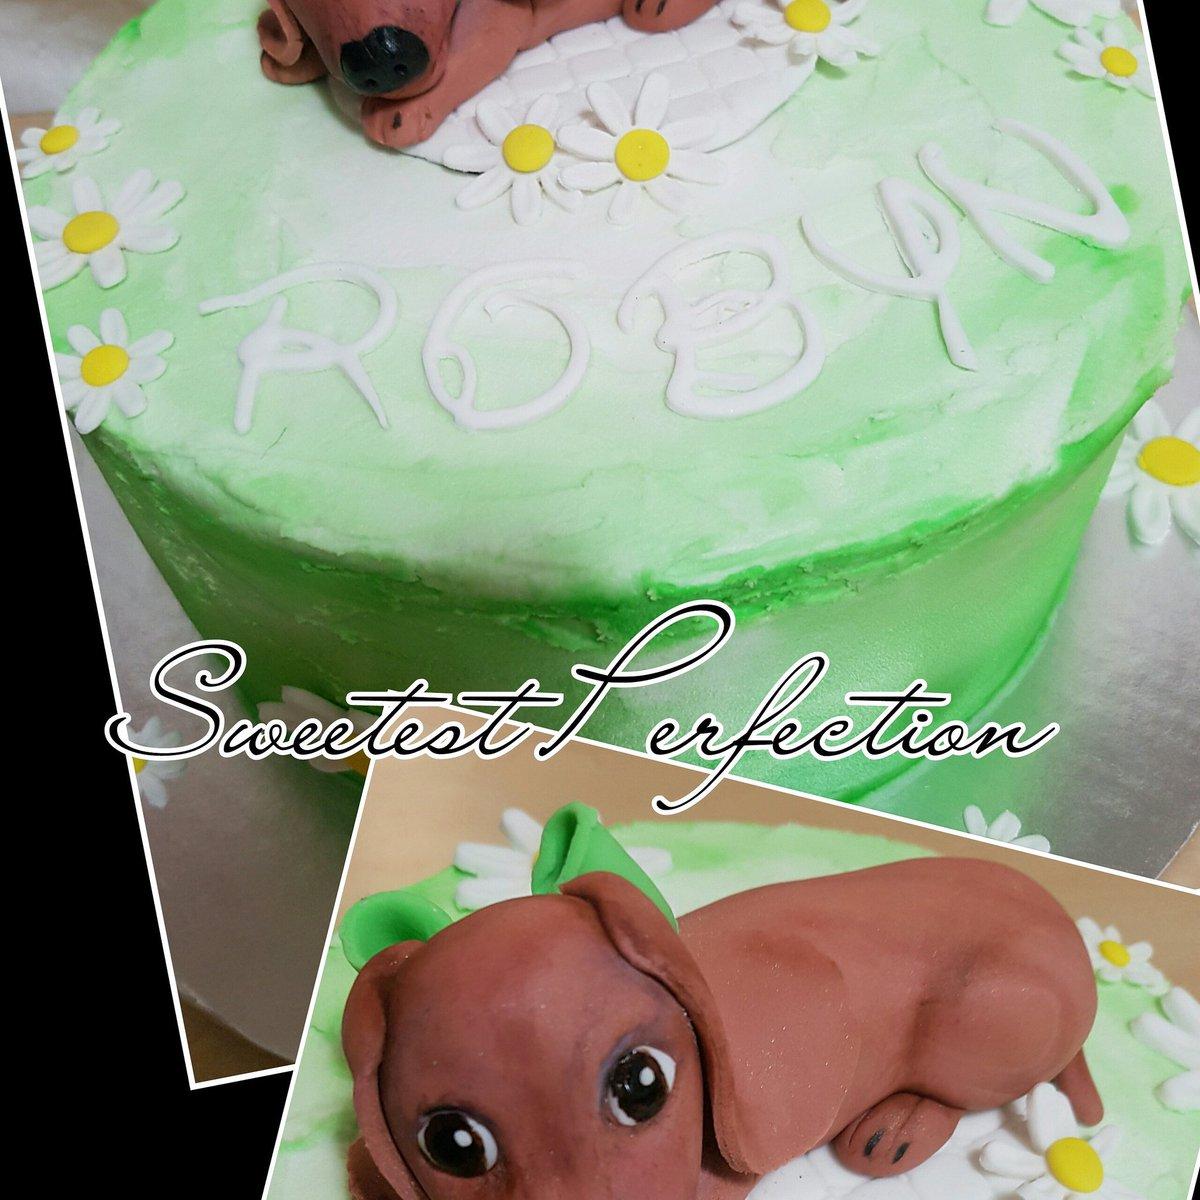 Sweetestperfectioncakes Hashtag On Twitter